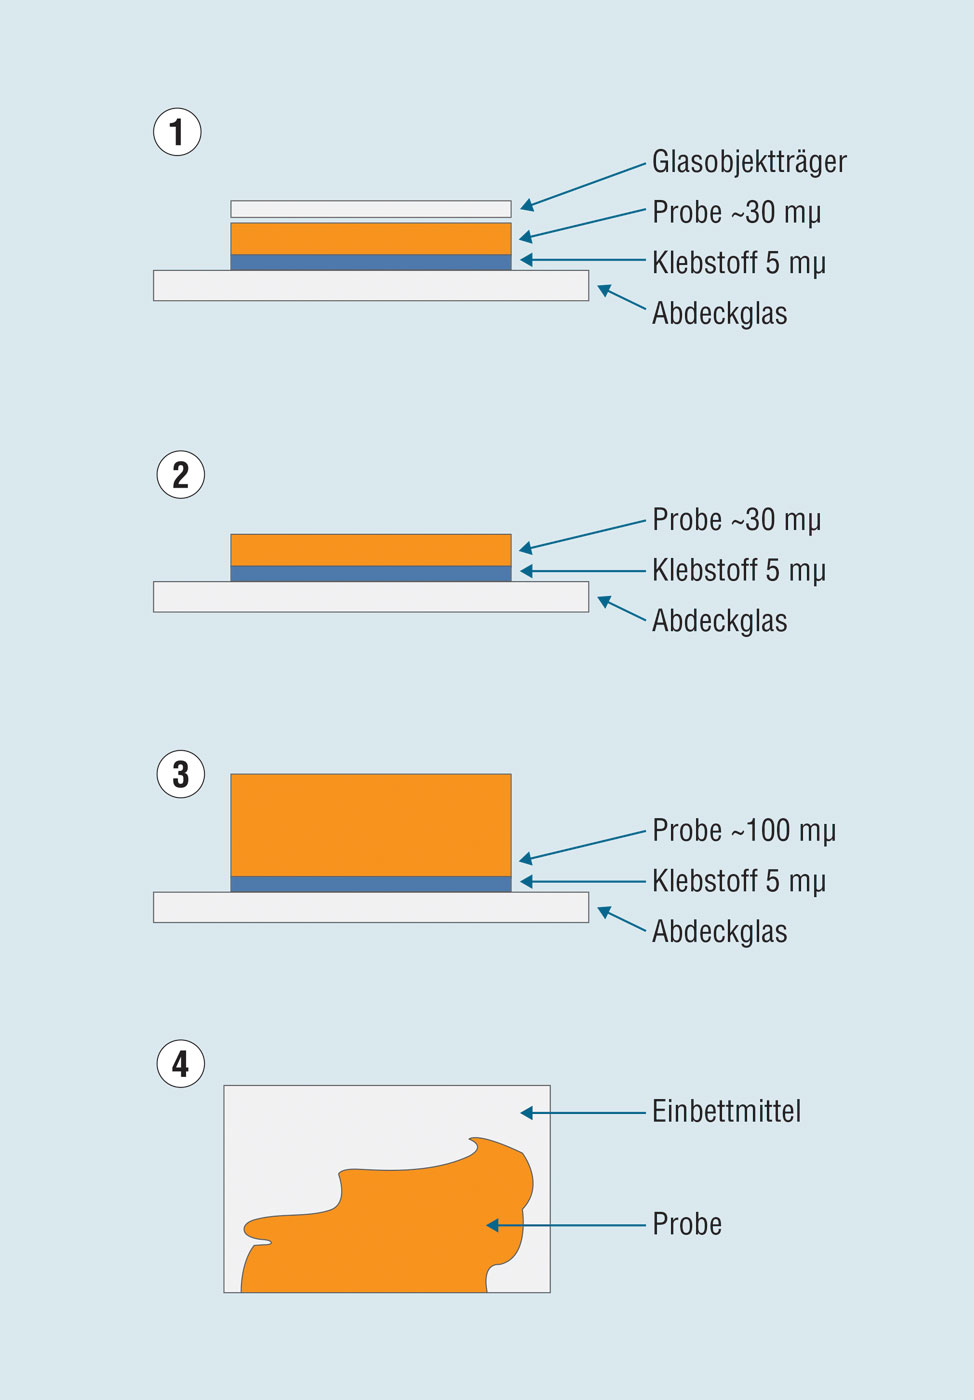 Specimen types in four groups